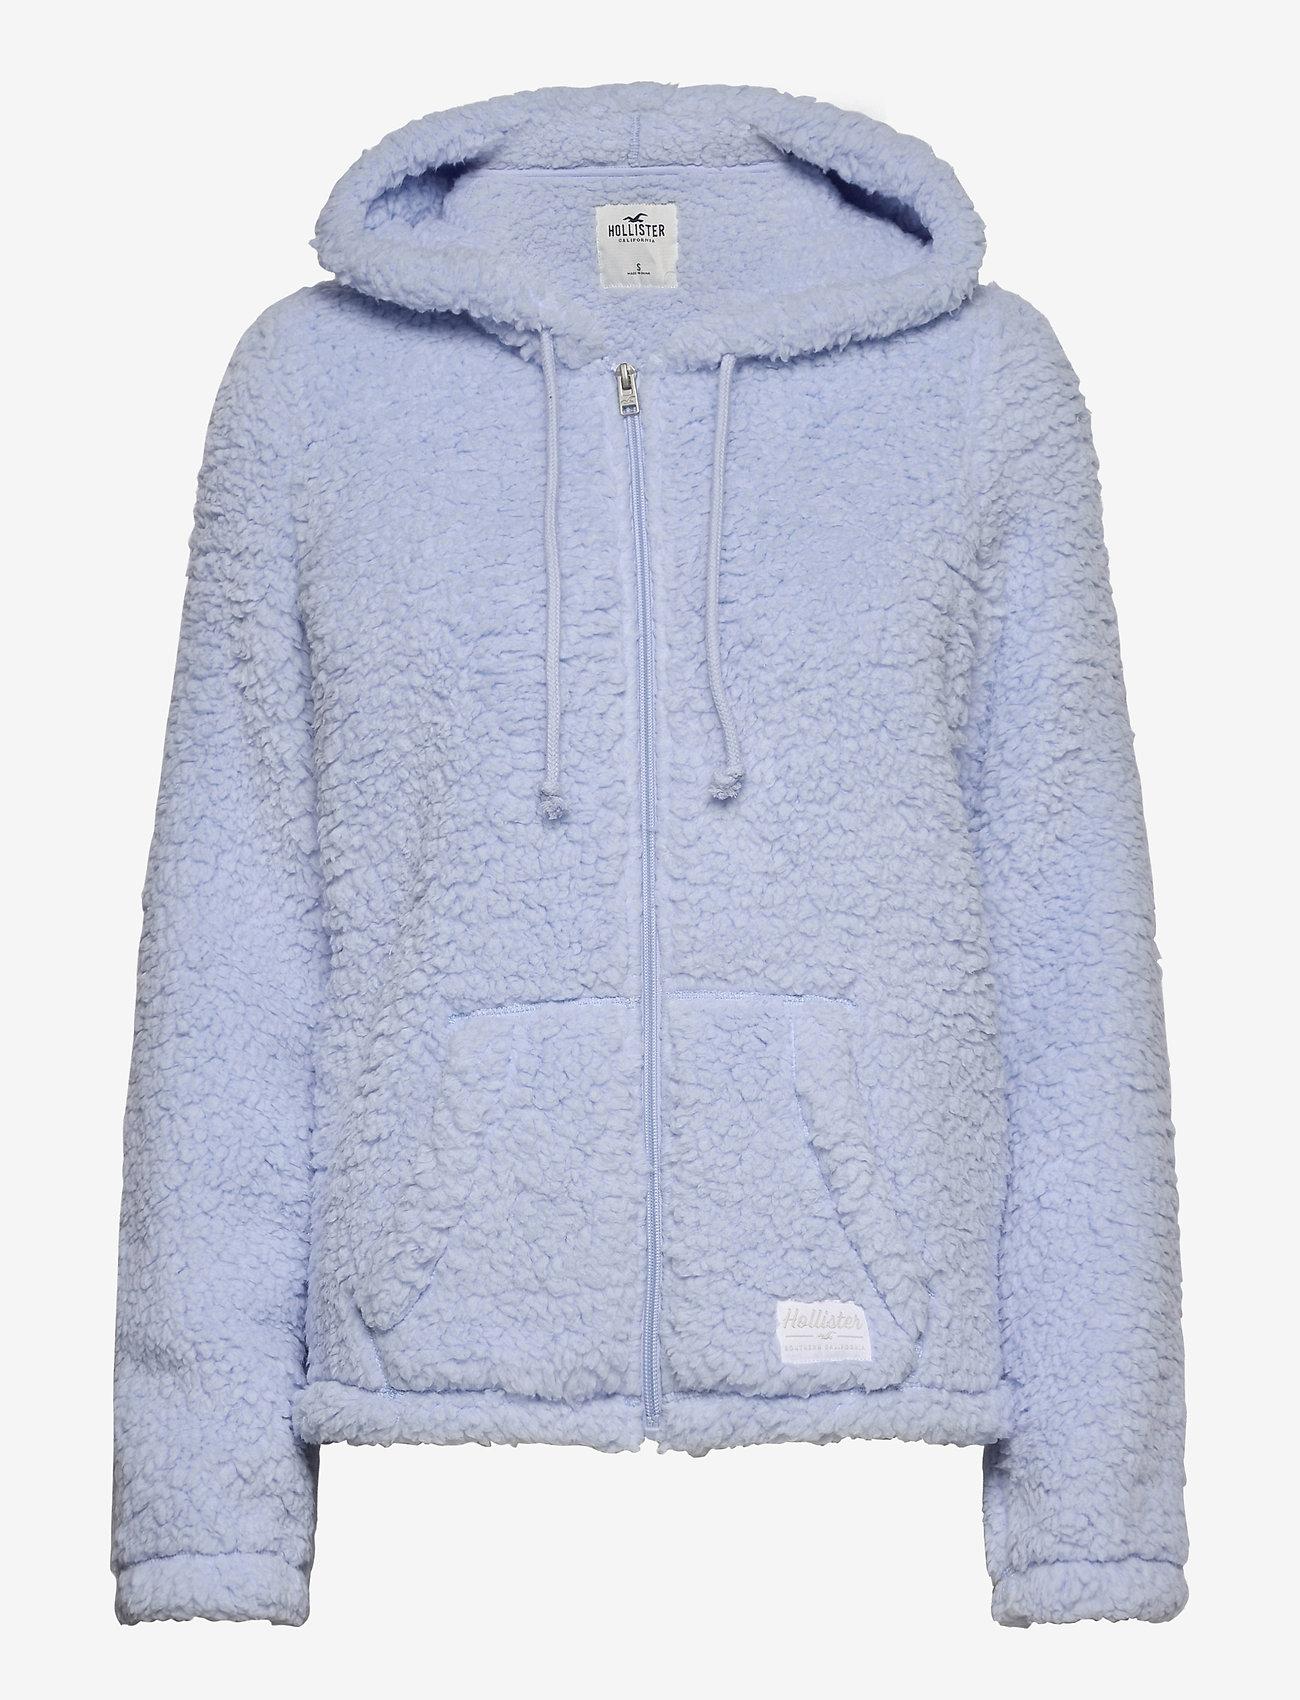 Hollister - HCo. GIRLS SWEATSHIRTS - fleece jassen - light blue - 0